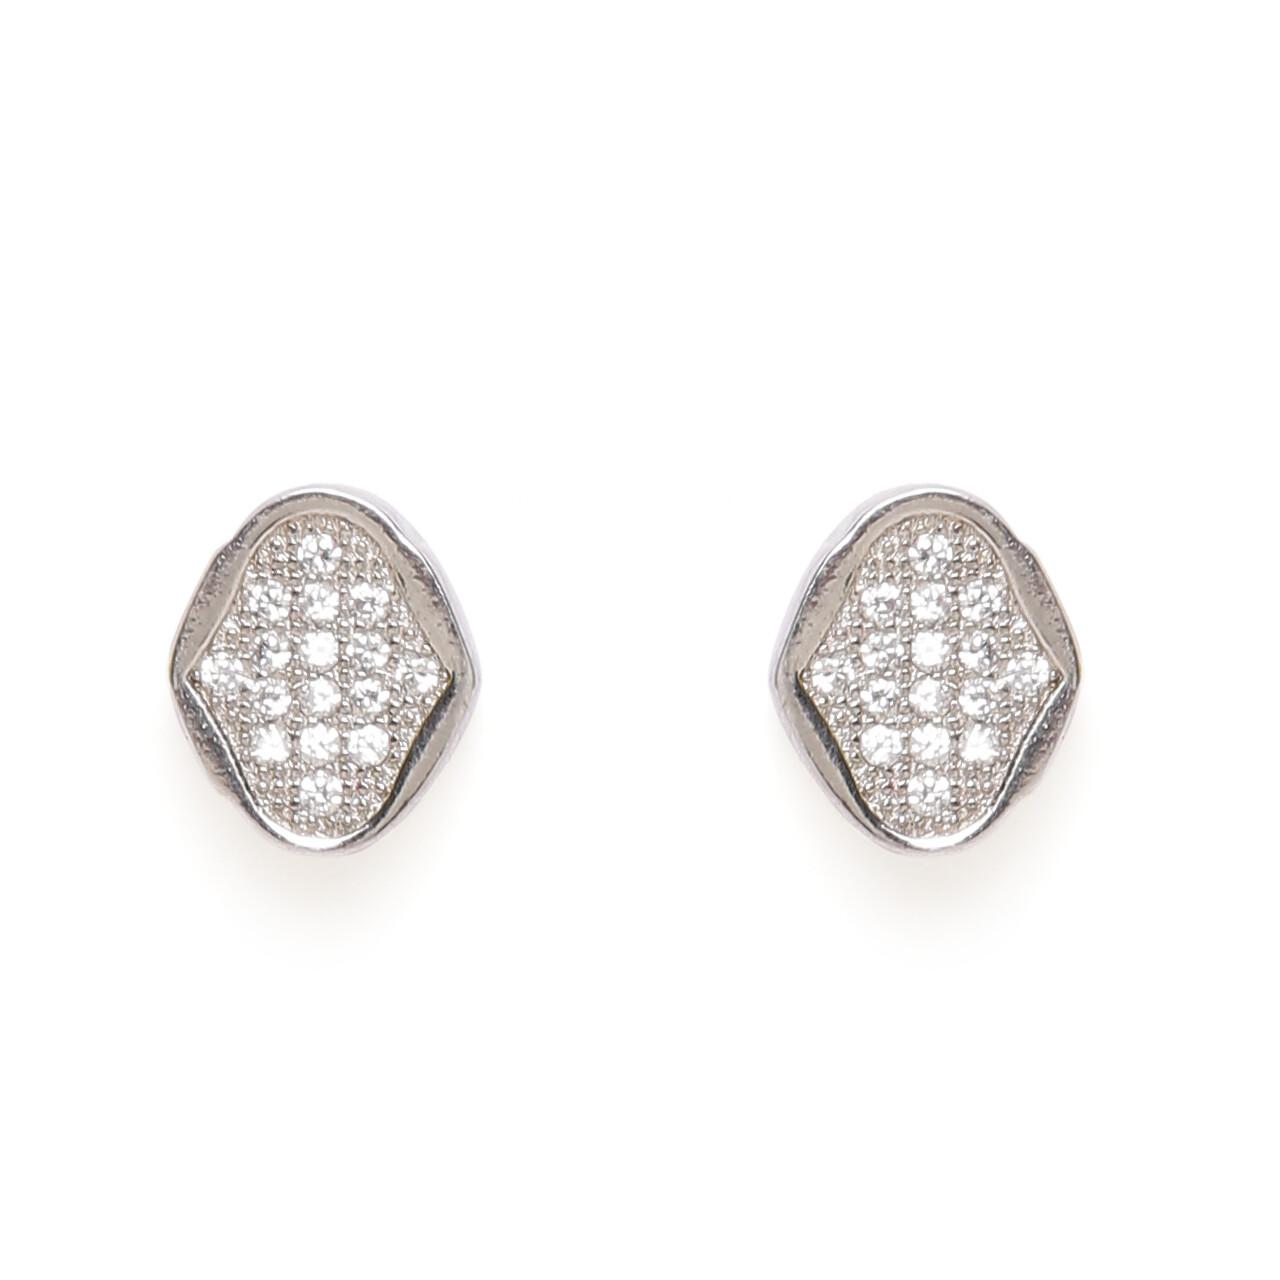 IndusDiva Micro Stone Studs Earring & Pendent Set